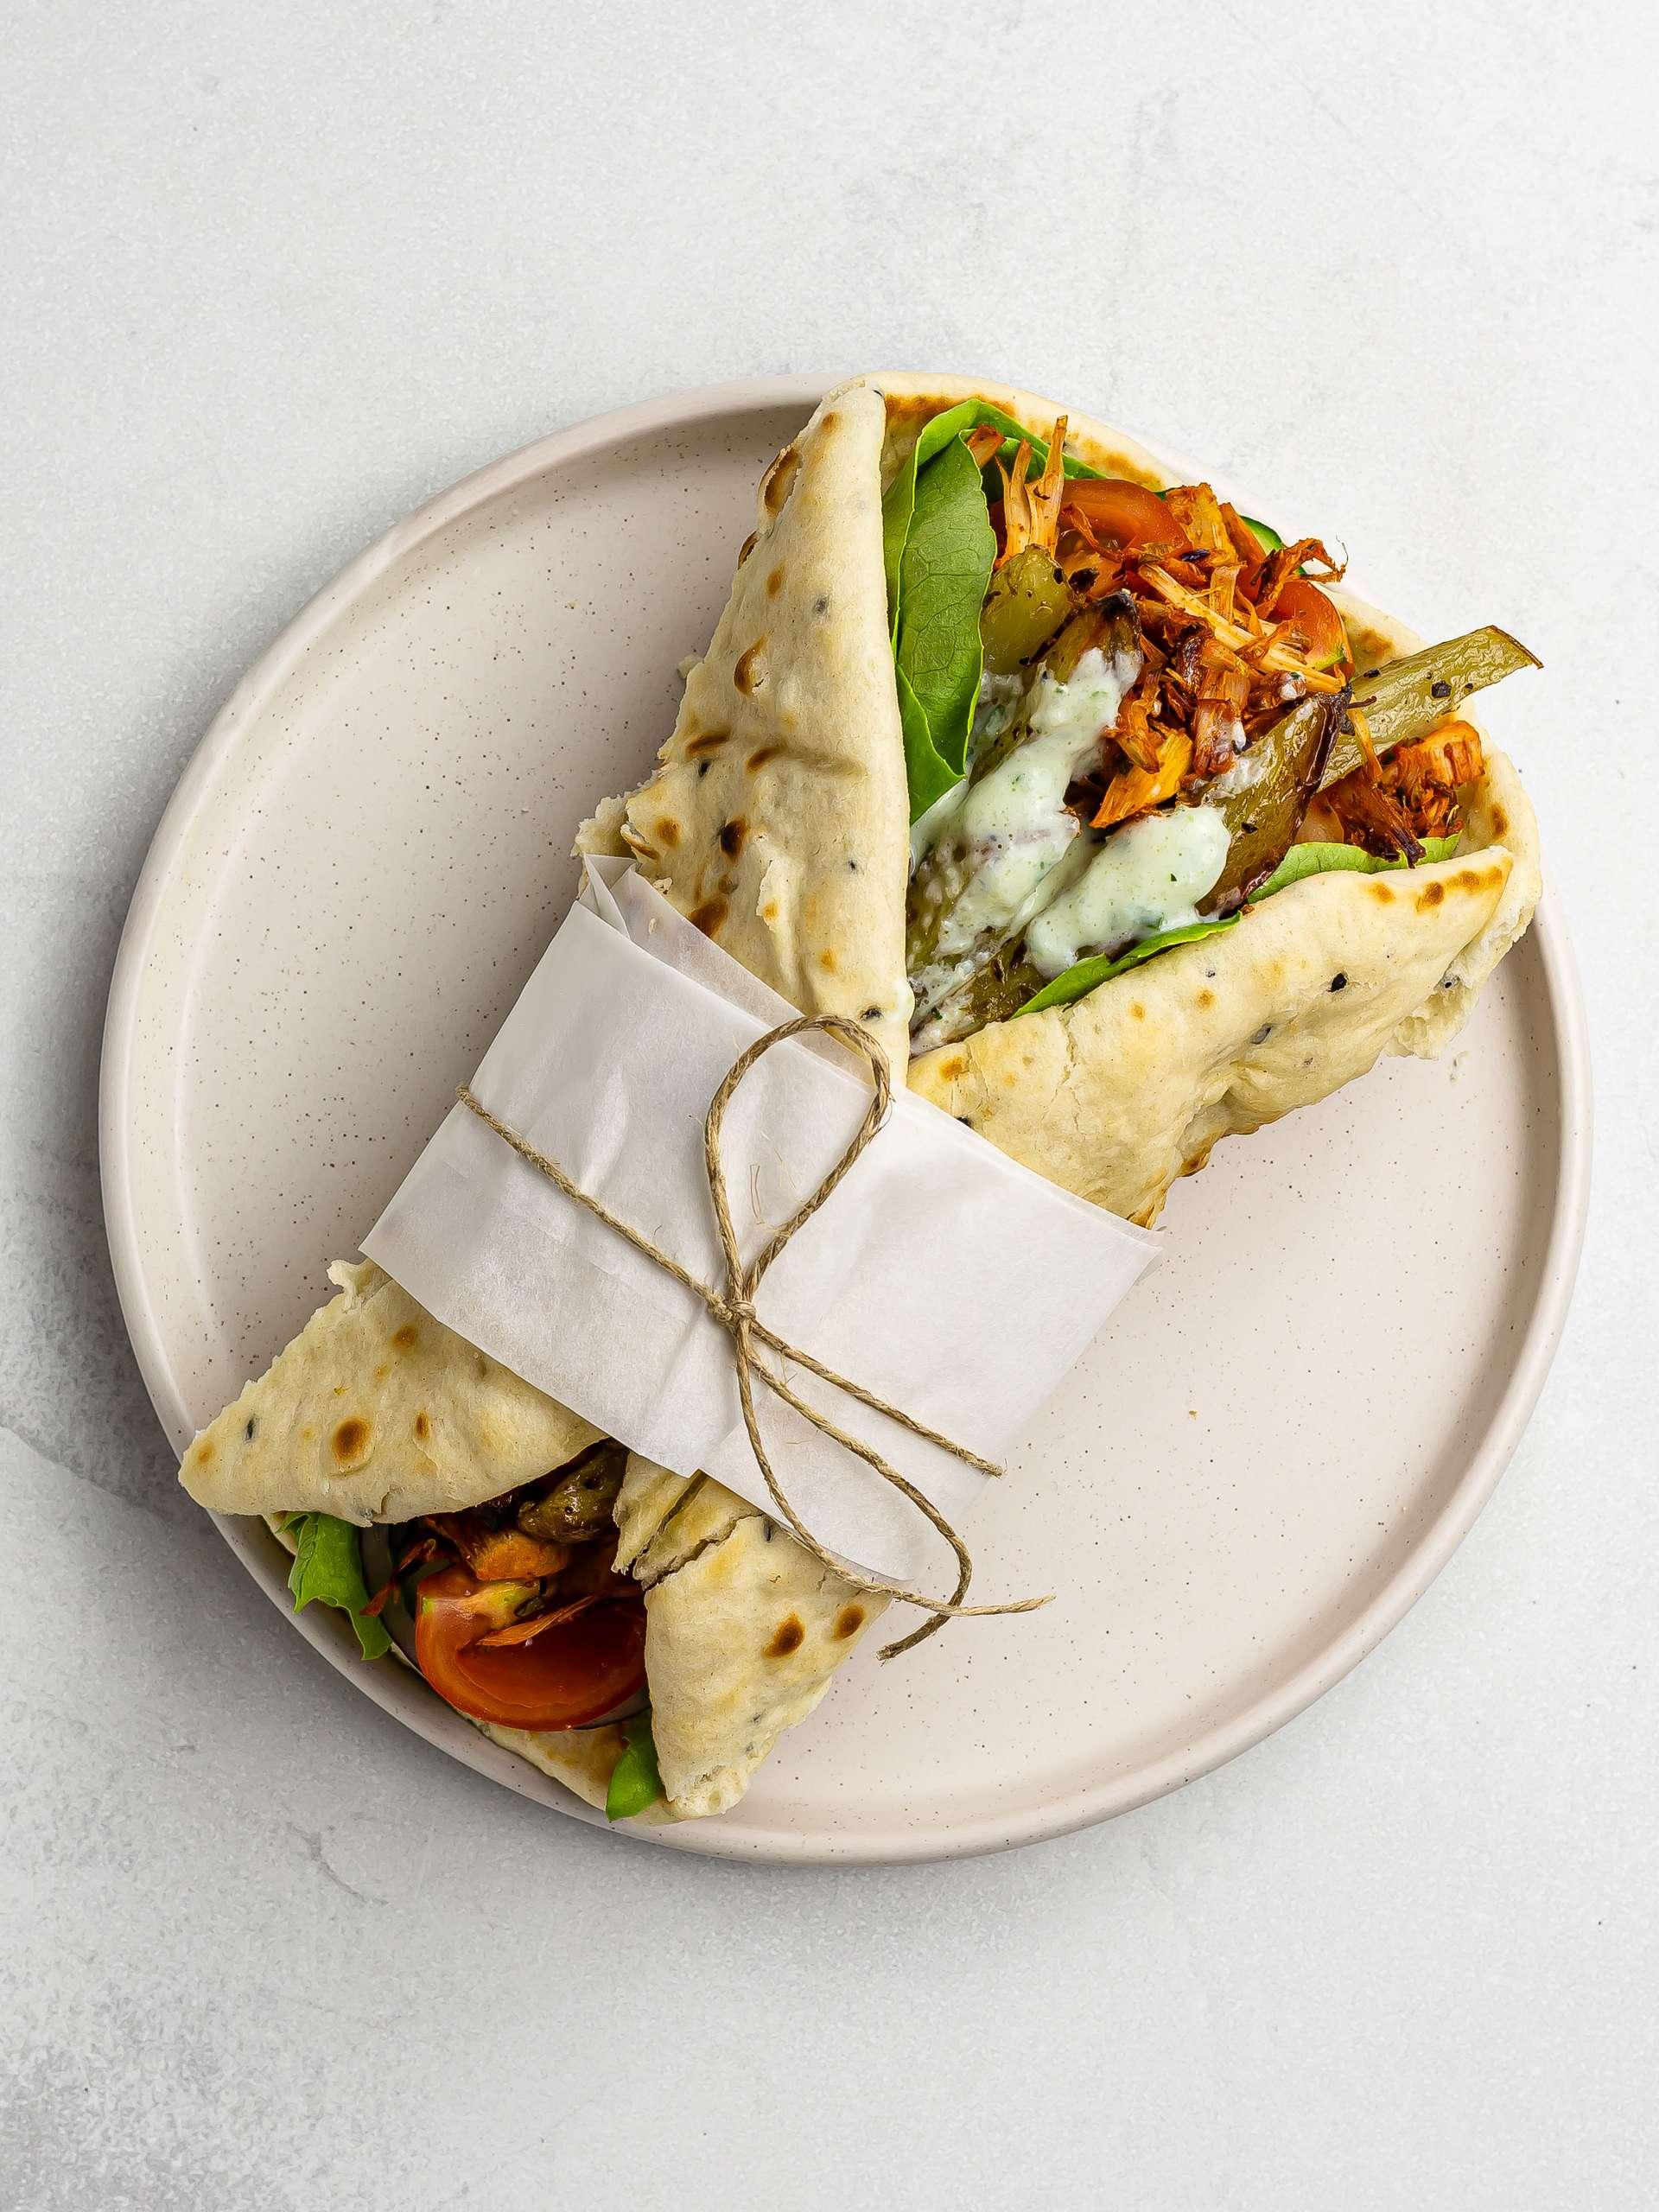 jackfruit gyros wrap on a plate